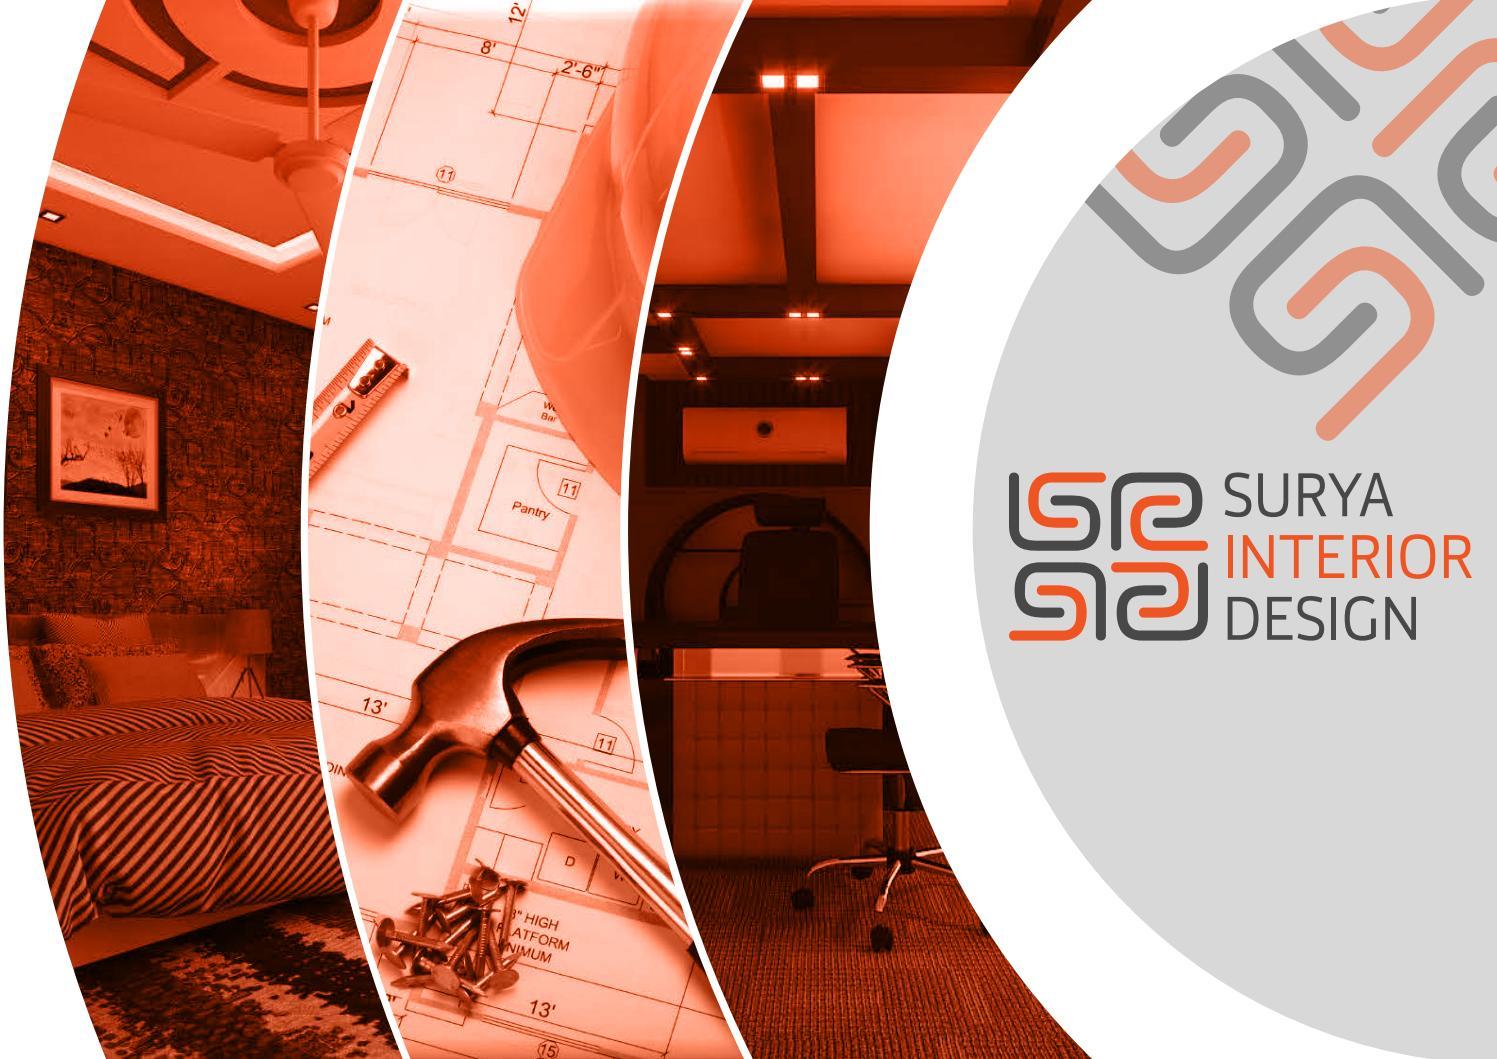 Surya Interior Designer Company Profile By Mediawavepk Issuu